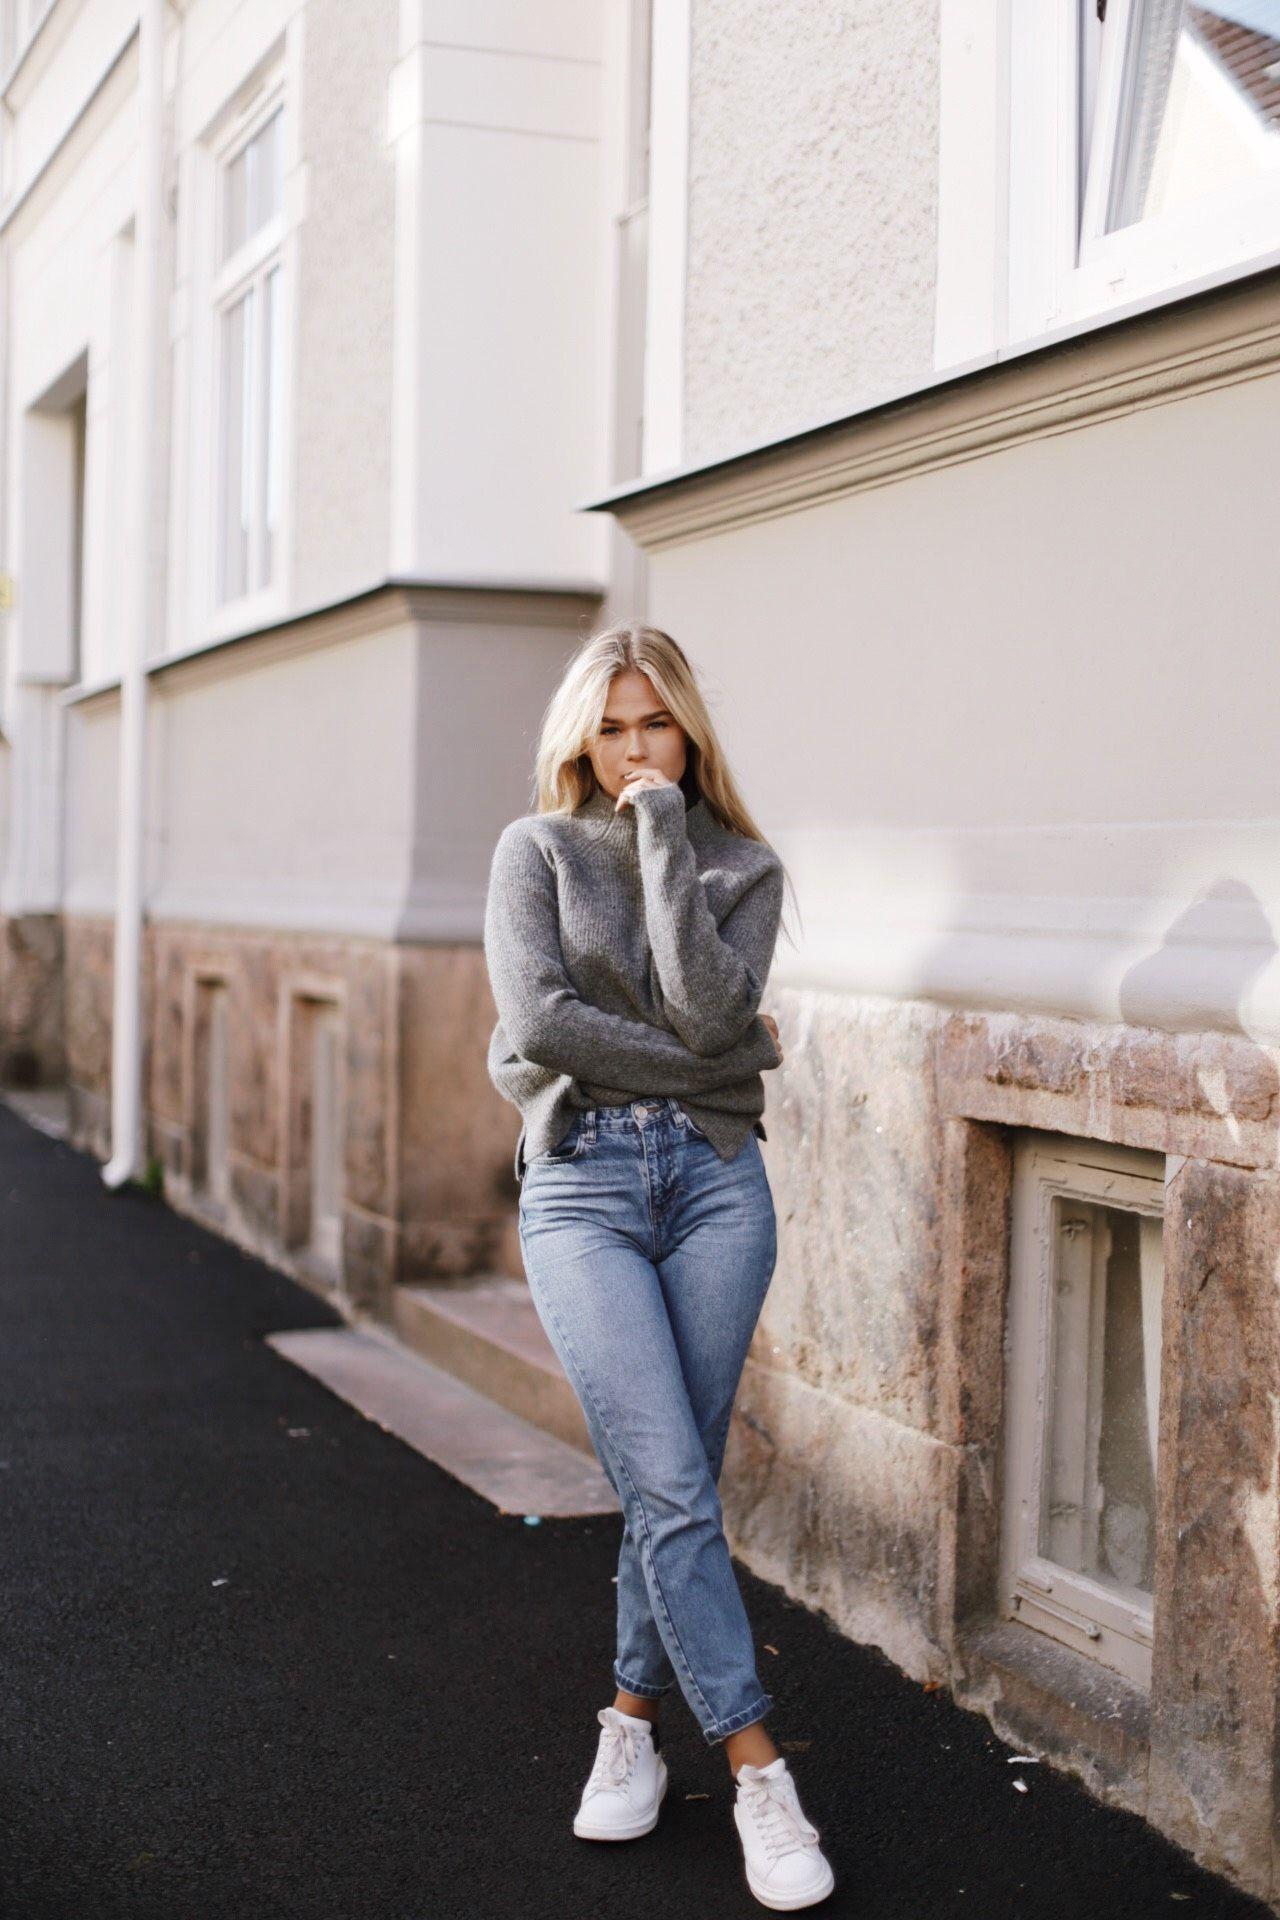 COZY KNIT | Hanna Schönberg | Höstmode, Kläder, Mysiga kläder